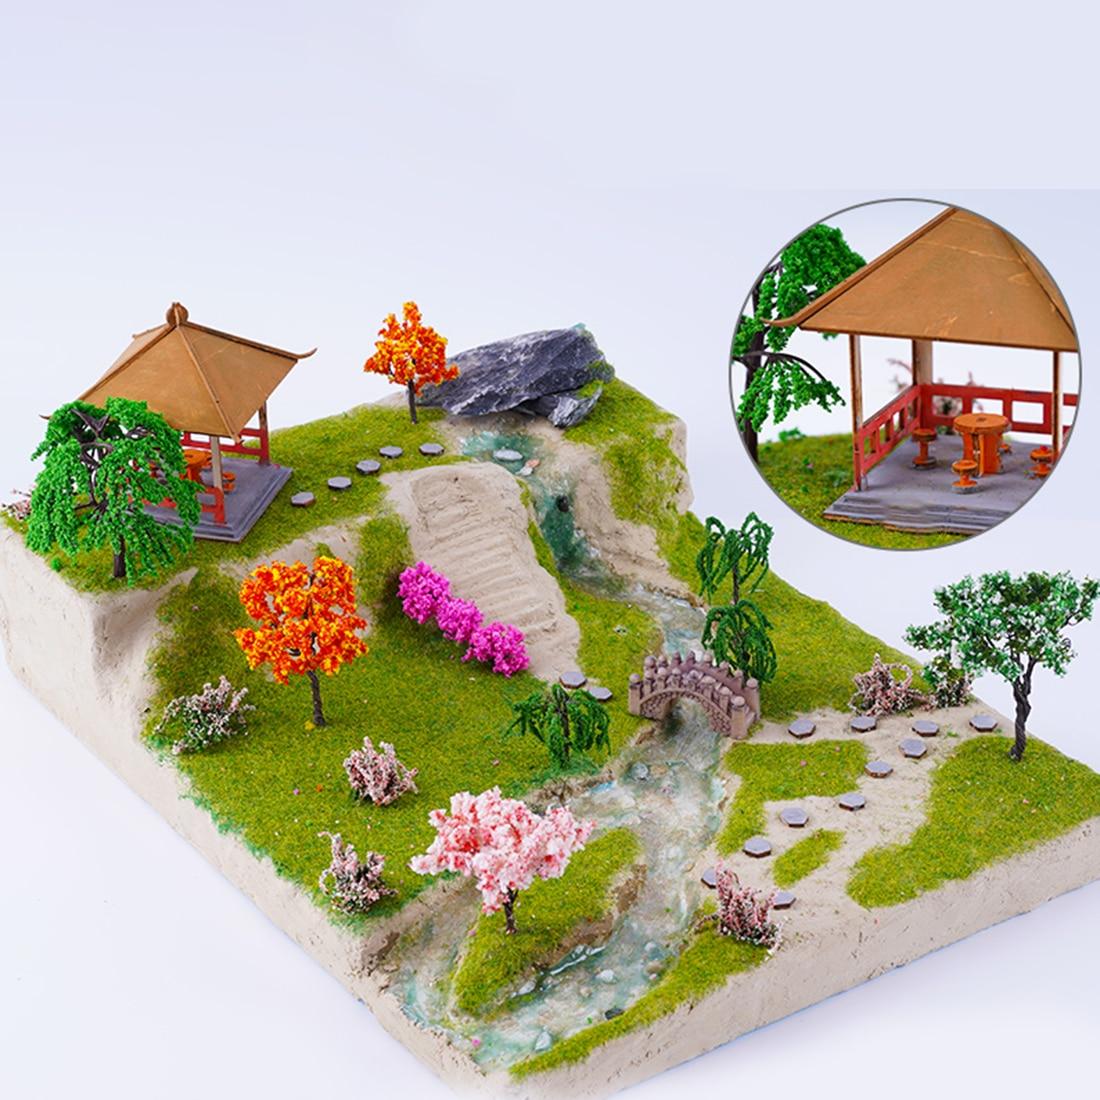 DIY Sand Table Model Building Material Kit Waterscape Cream Landscaping Mud Pavilion Outdoor Landscape Decor